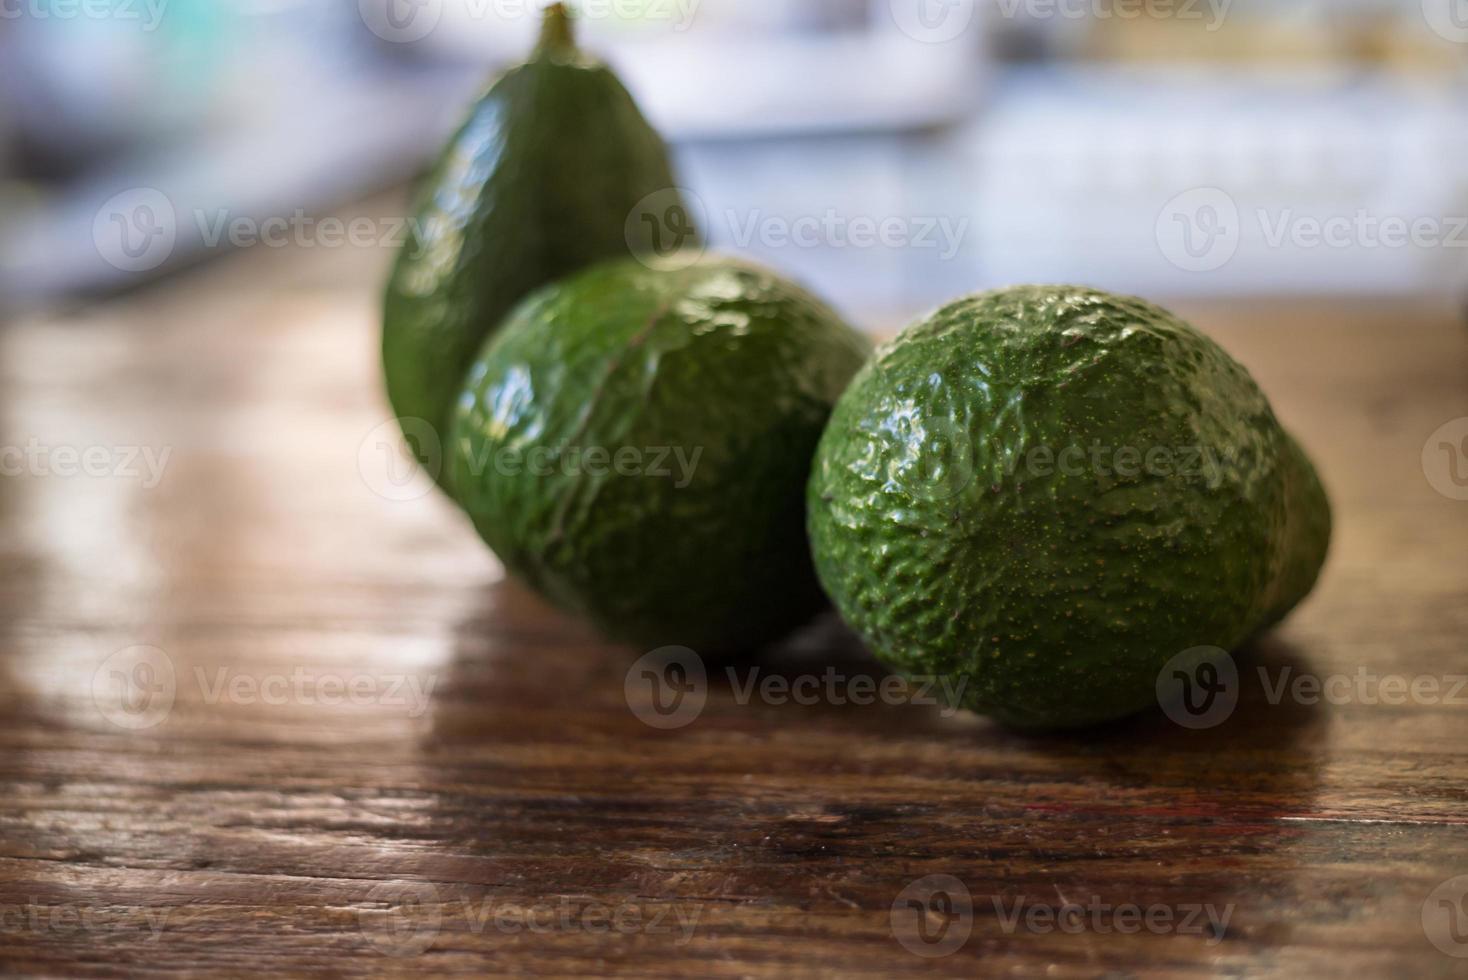 leckere Avocado, rohes tropisches Essen. foto